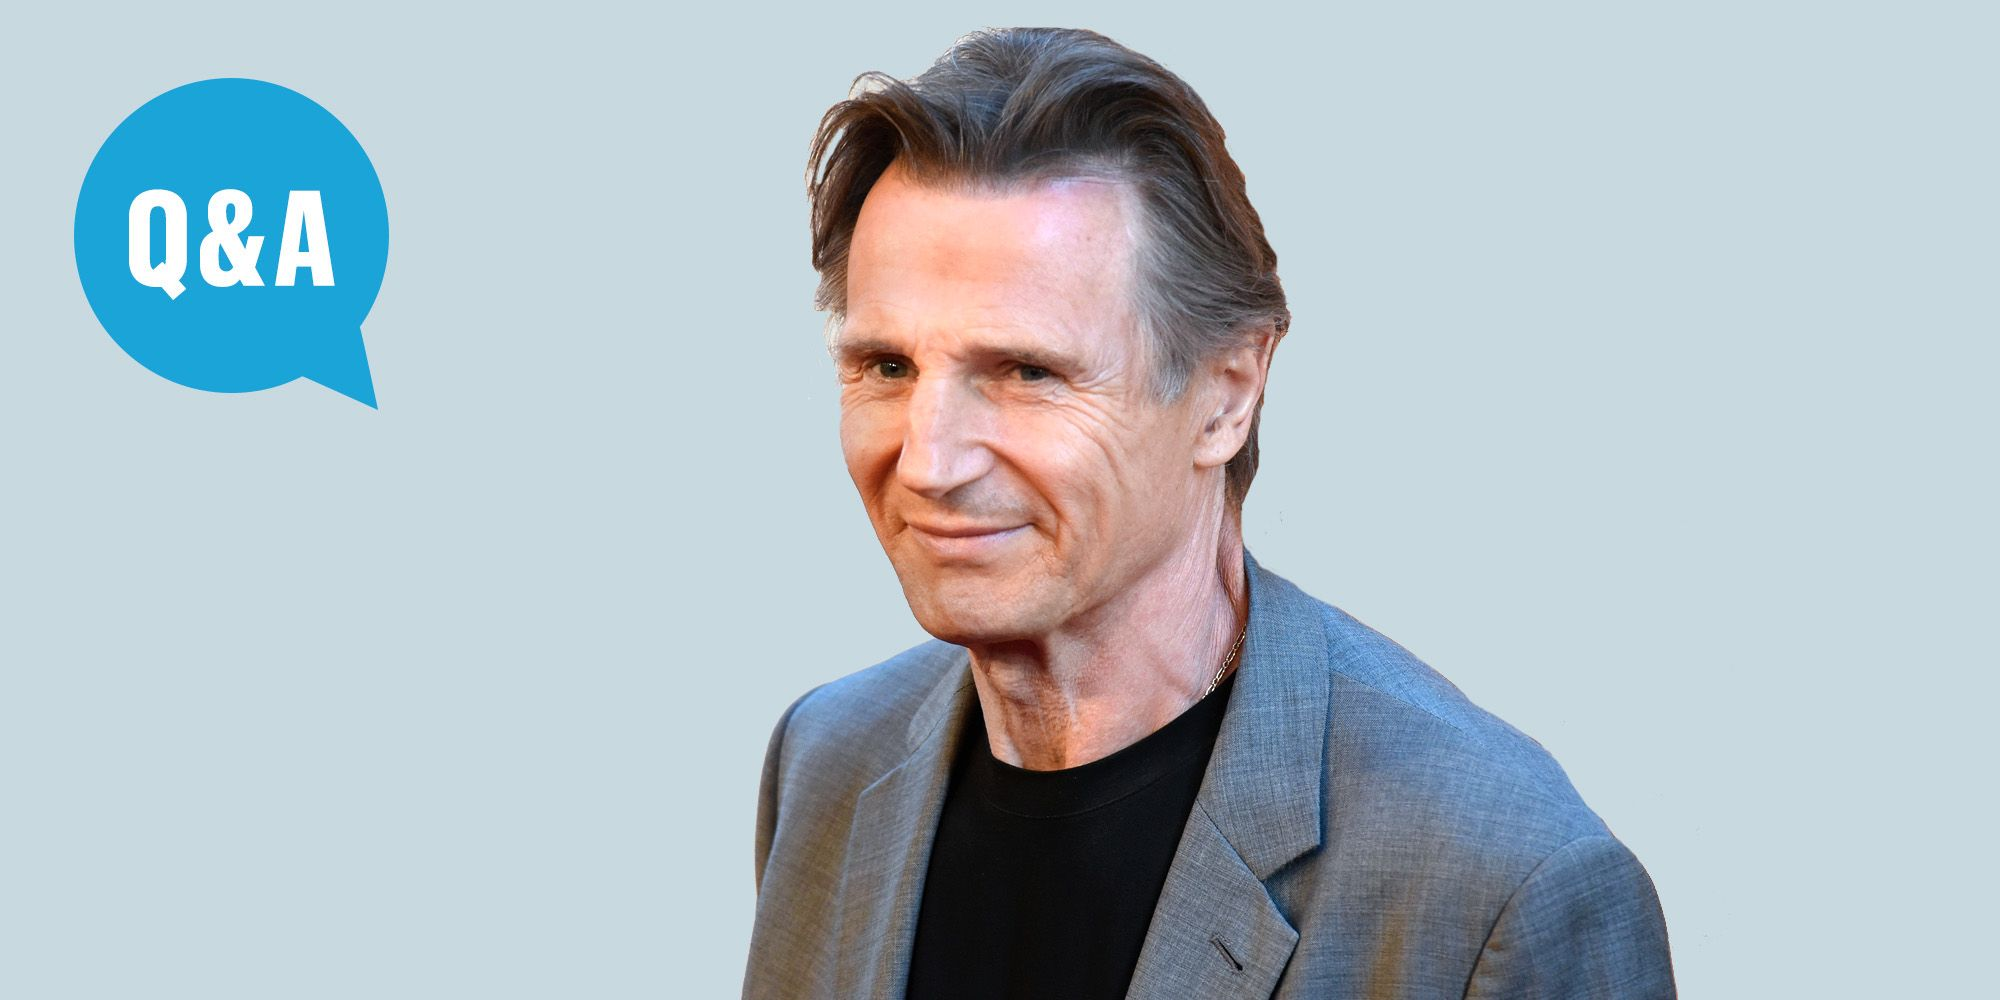 Liam Neeson on Star Wars Phantom Menace Dialogue, Speeches